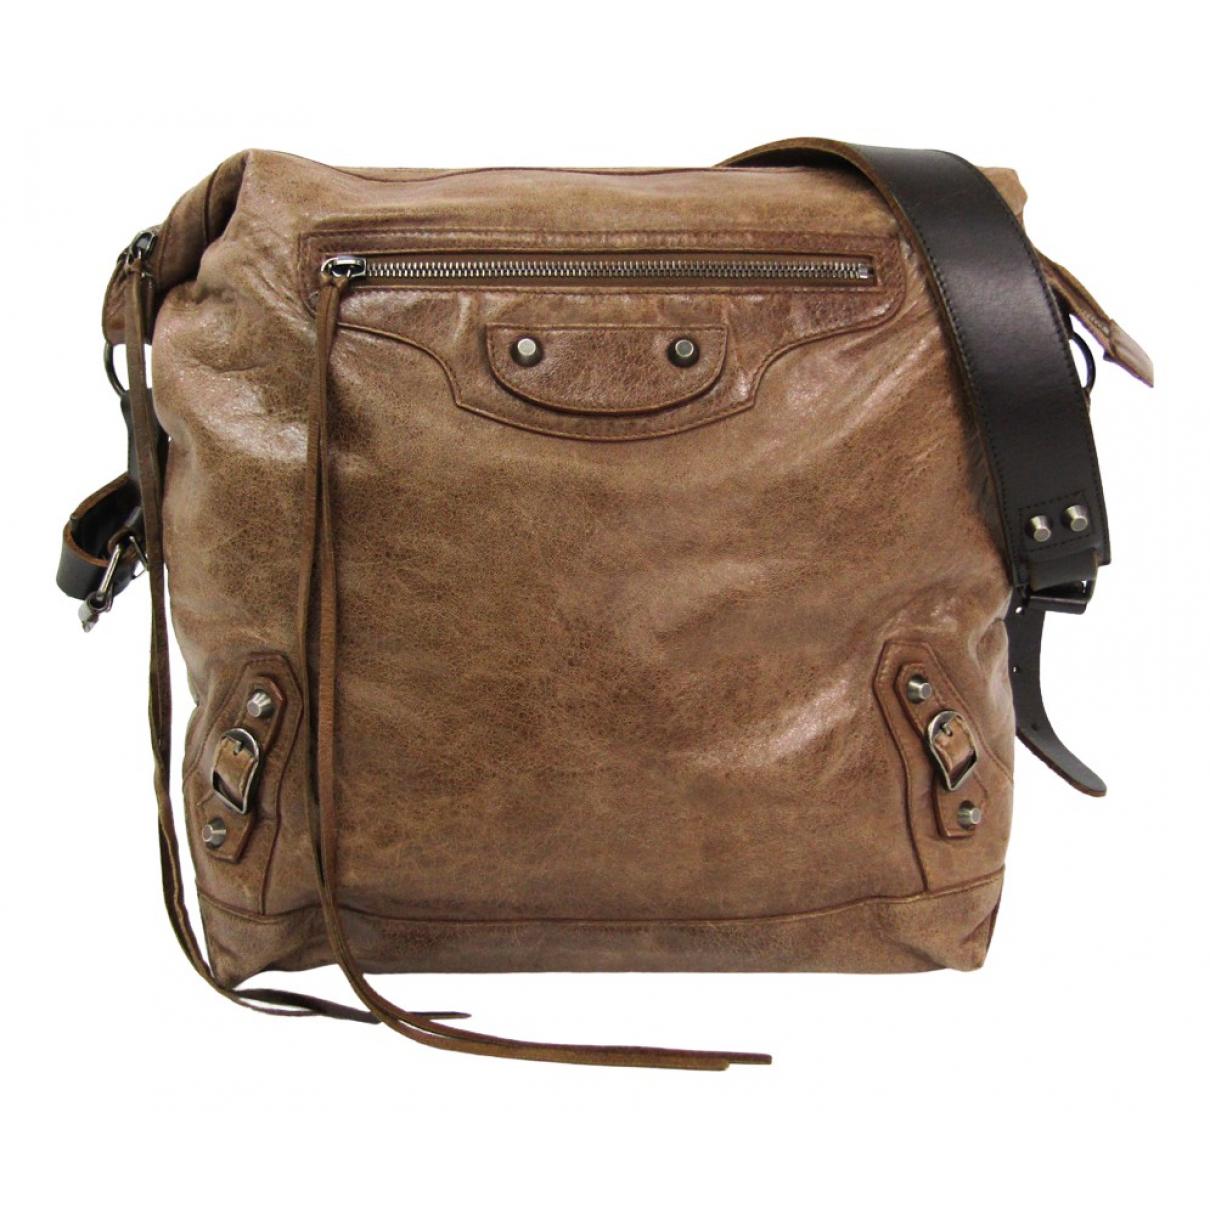 Balenciaga Day  Handtasche in  Braun Leder